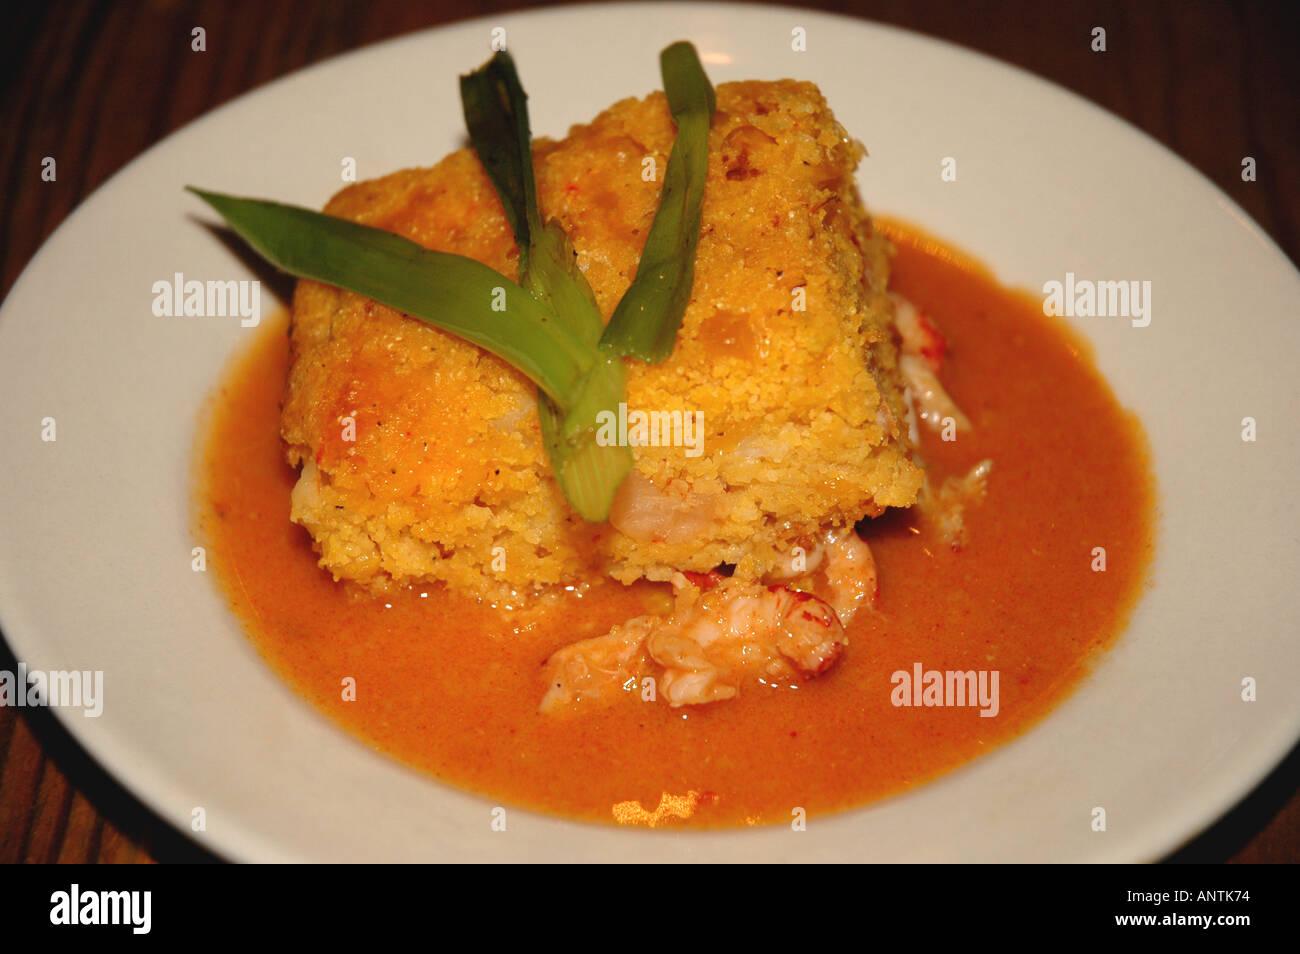 Louisiana Lafayette cajun country cooking cuisine acadiana crawfish cornbread - Stock Image